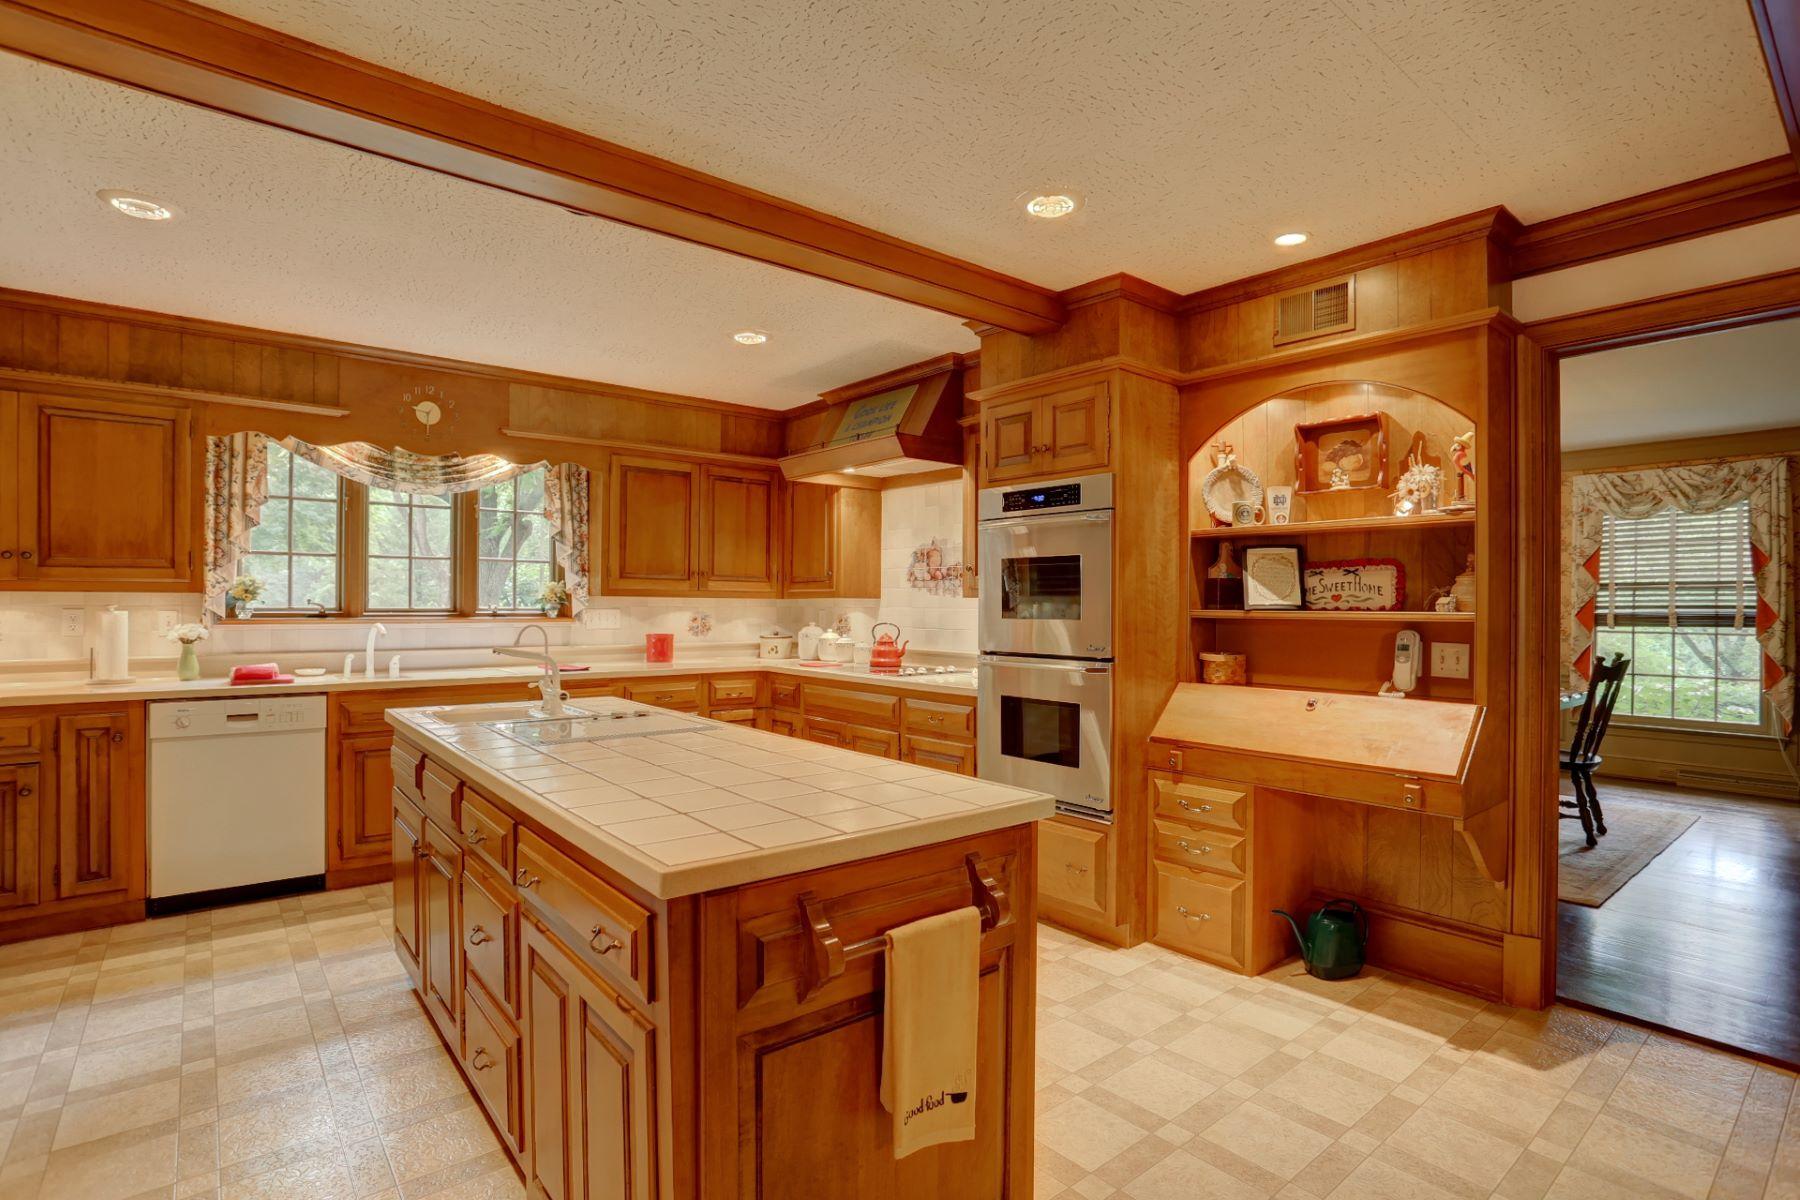 Additional photo for property listing at 1313 Hunsicker Road  Lancaster, Pennsylvania 17601 Estados Unidos